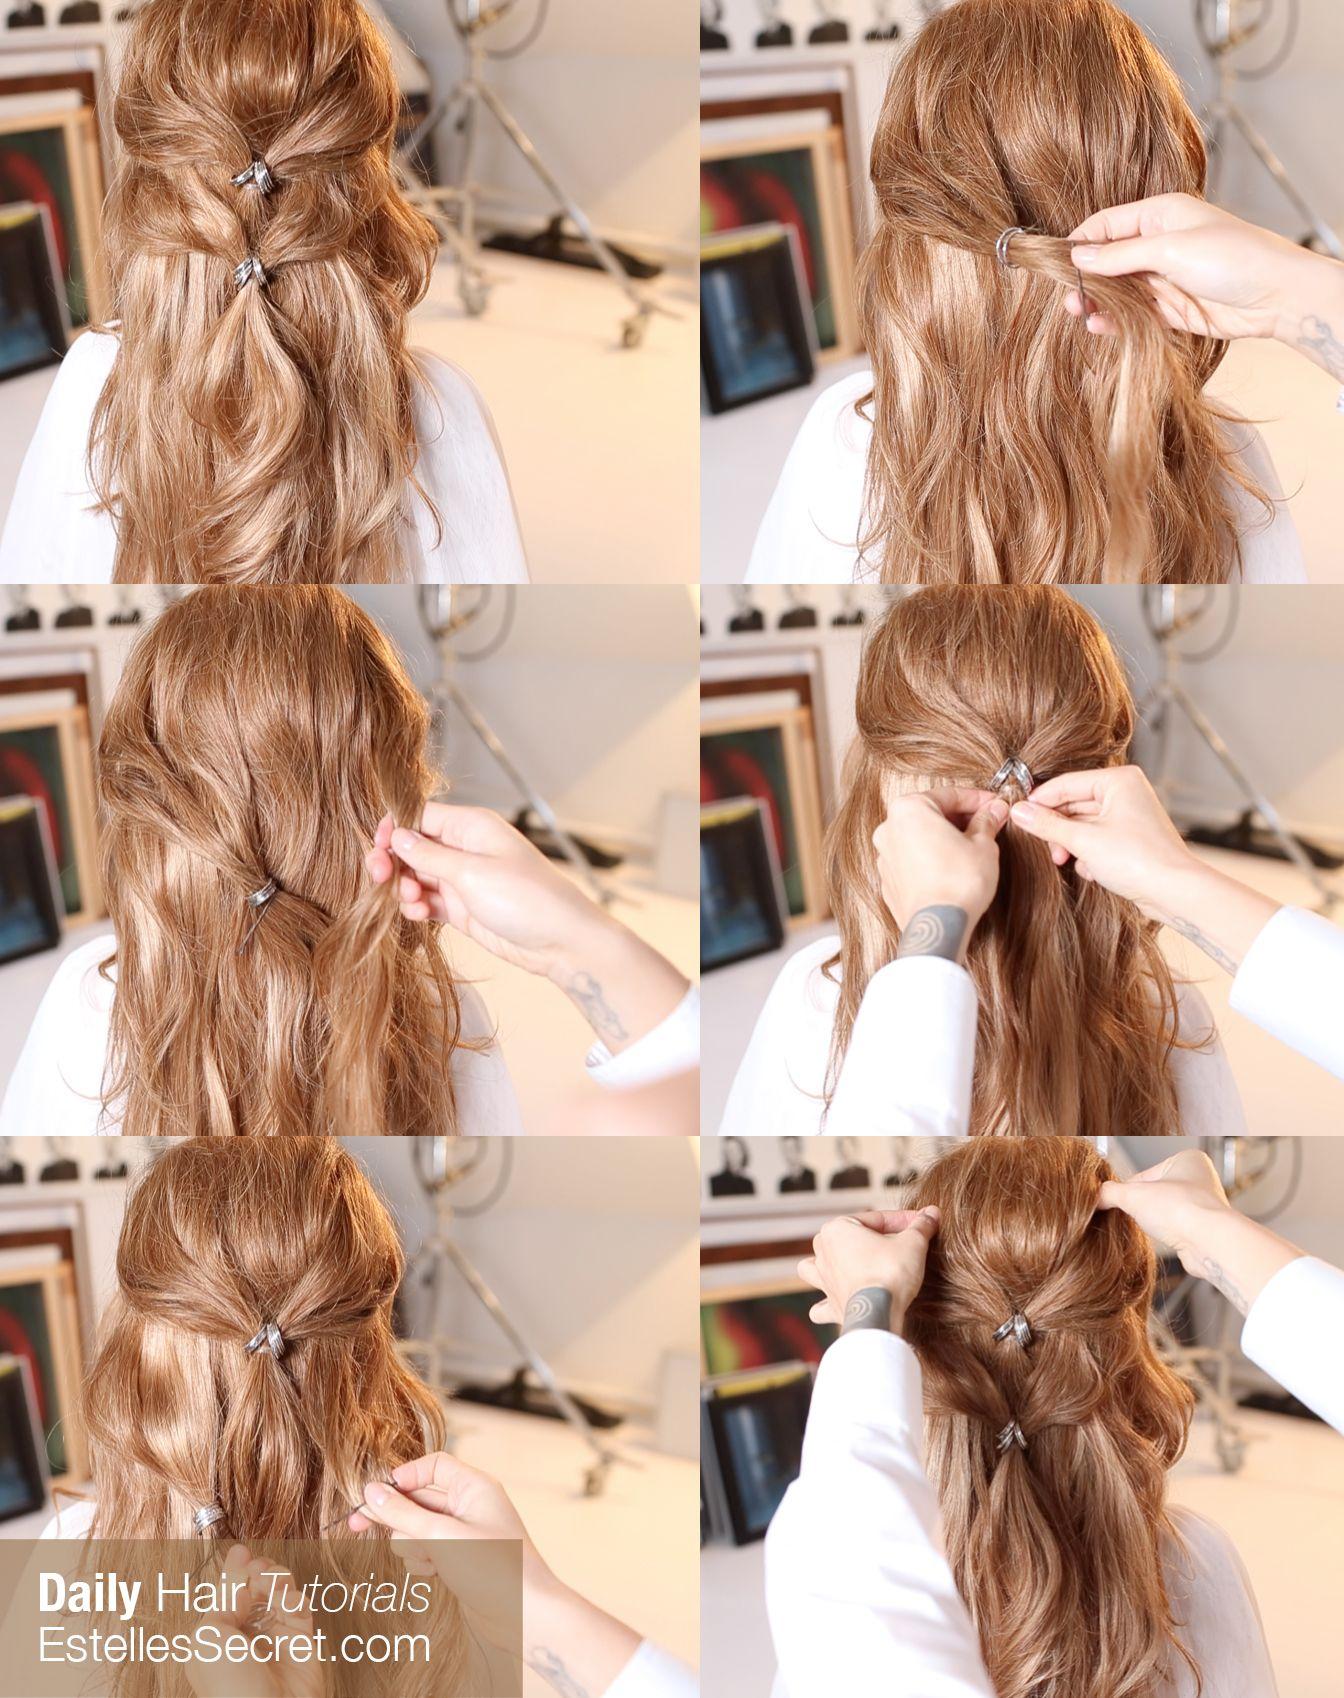 Romantic Greek Goddess Inspired Half Updo Using Estelles Secret Clip In Hair Extensions Quick Easy Hairs Easy Hairstyles Hair Styles Short Hair Styles Easy